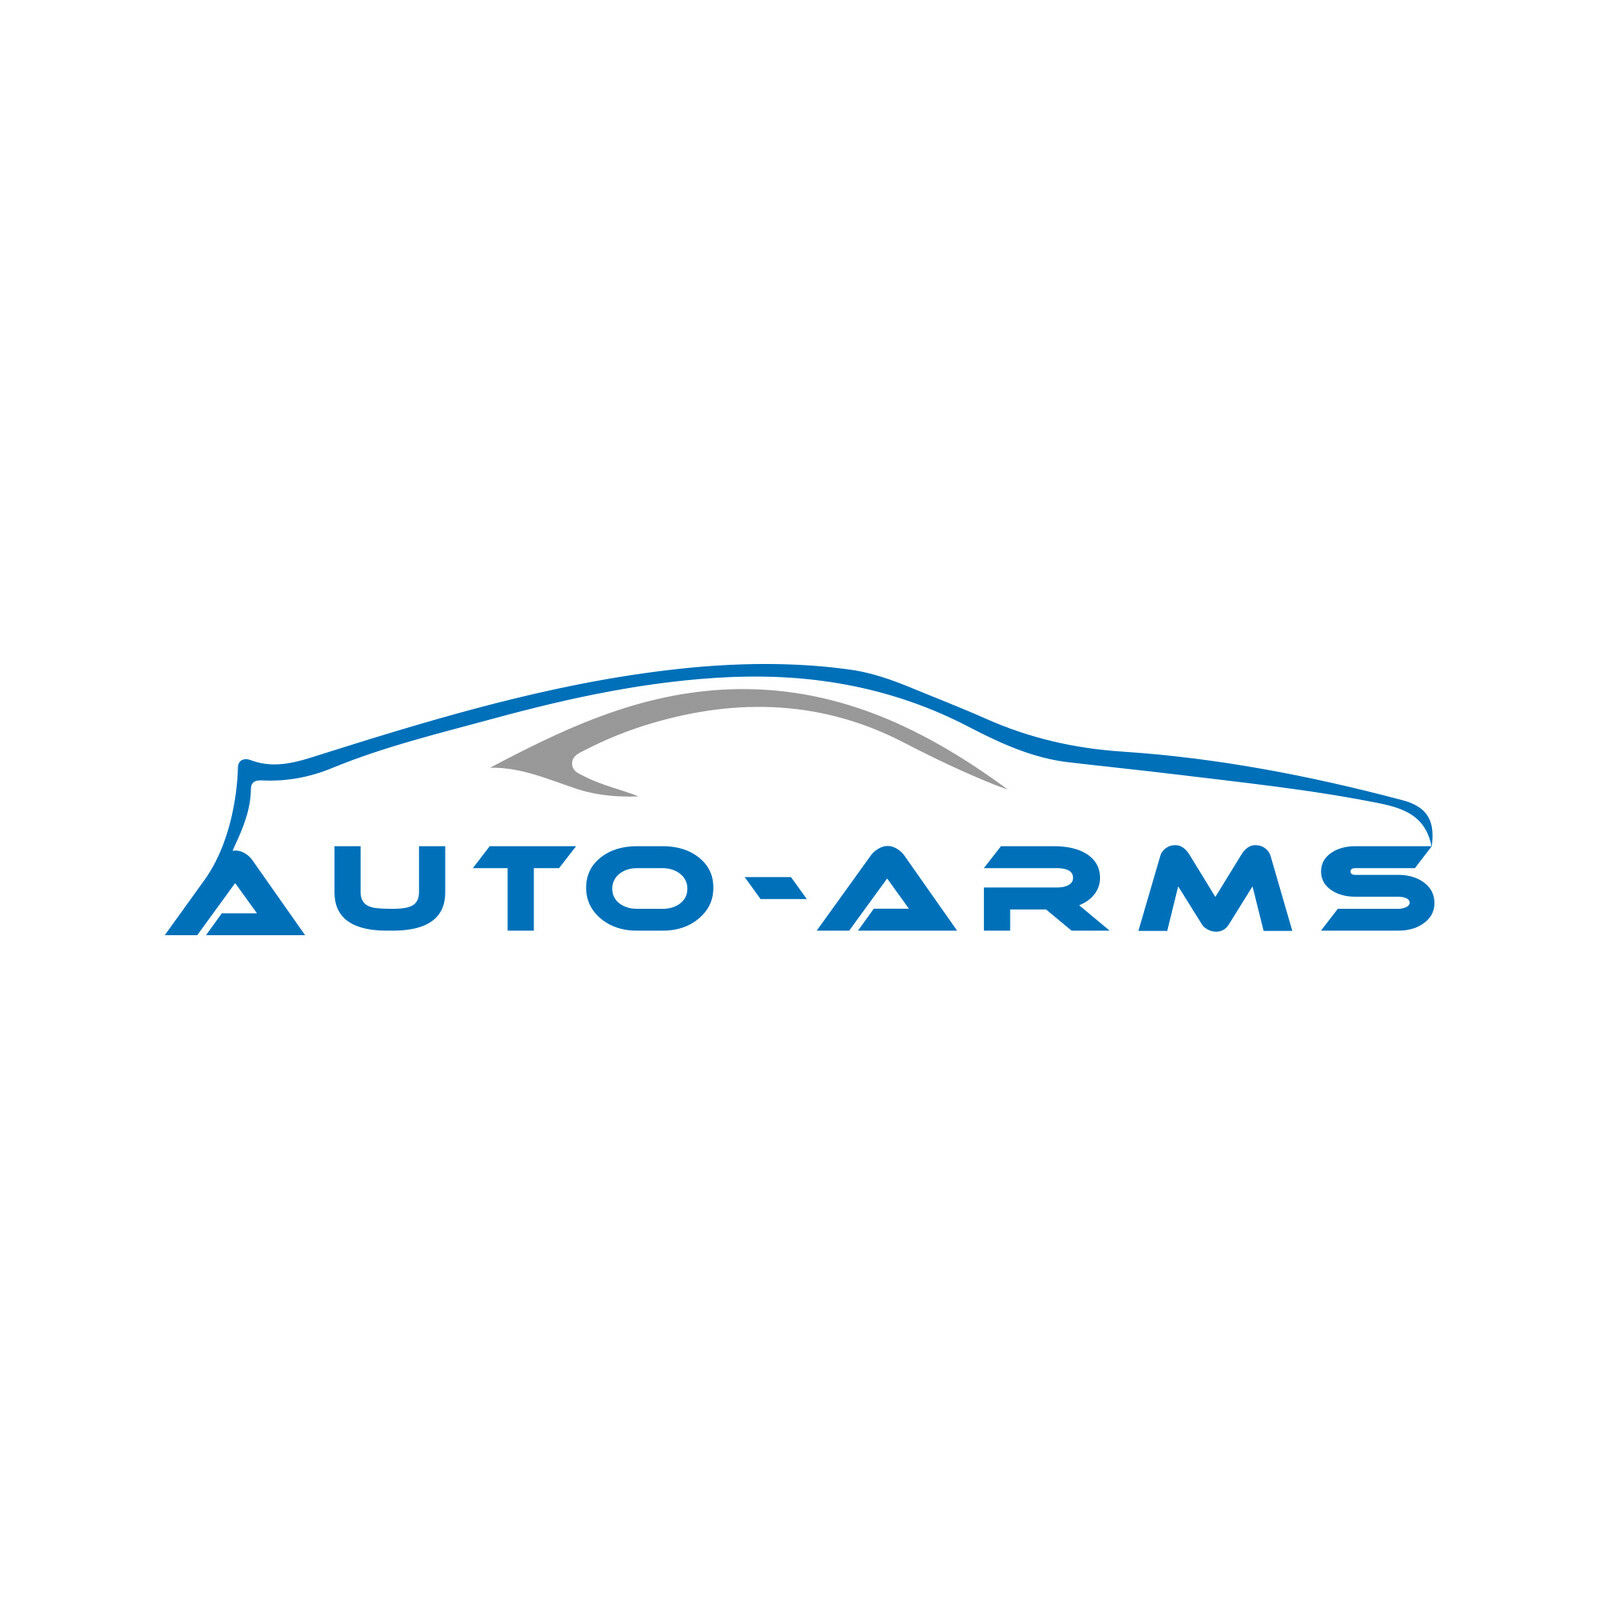 Auto-Arms